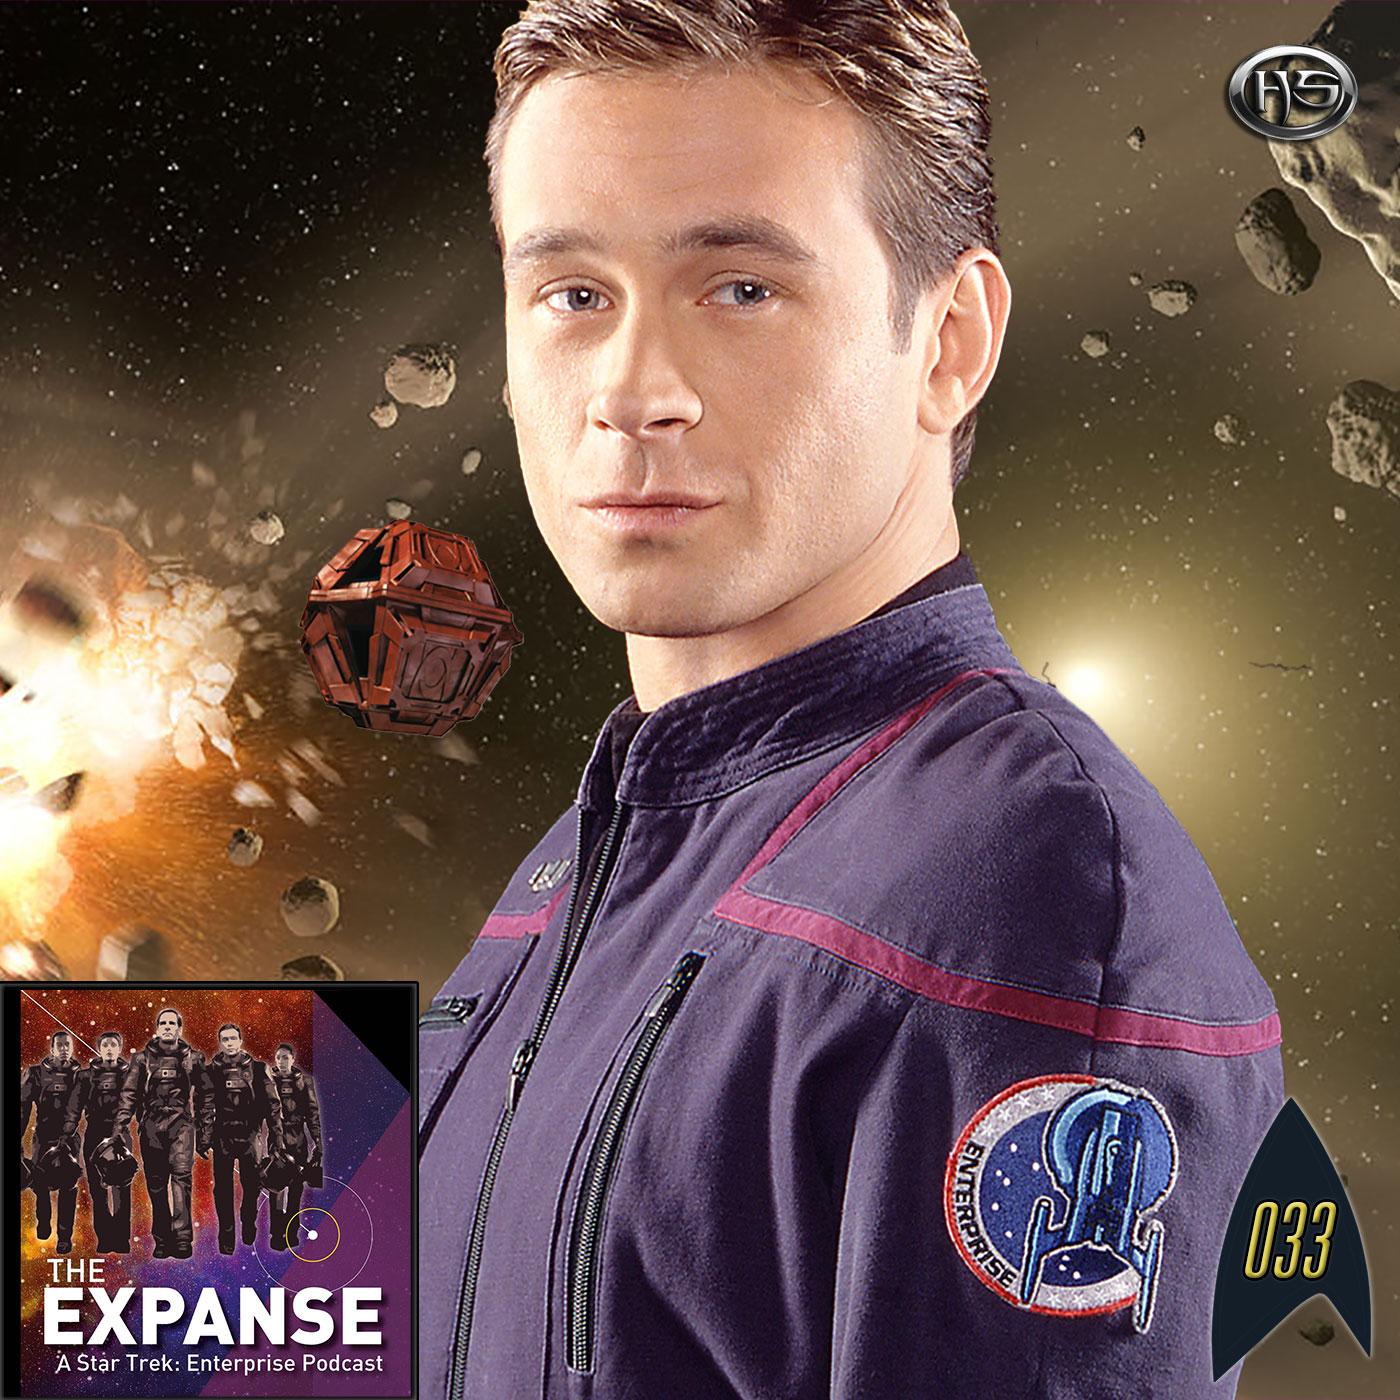 The Expanse Episode 33